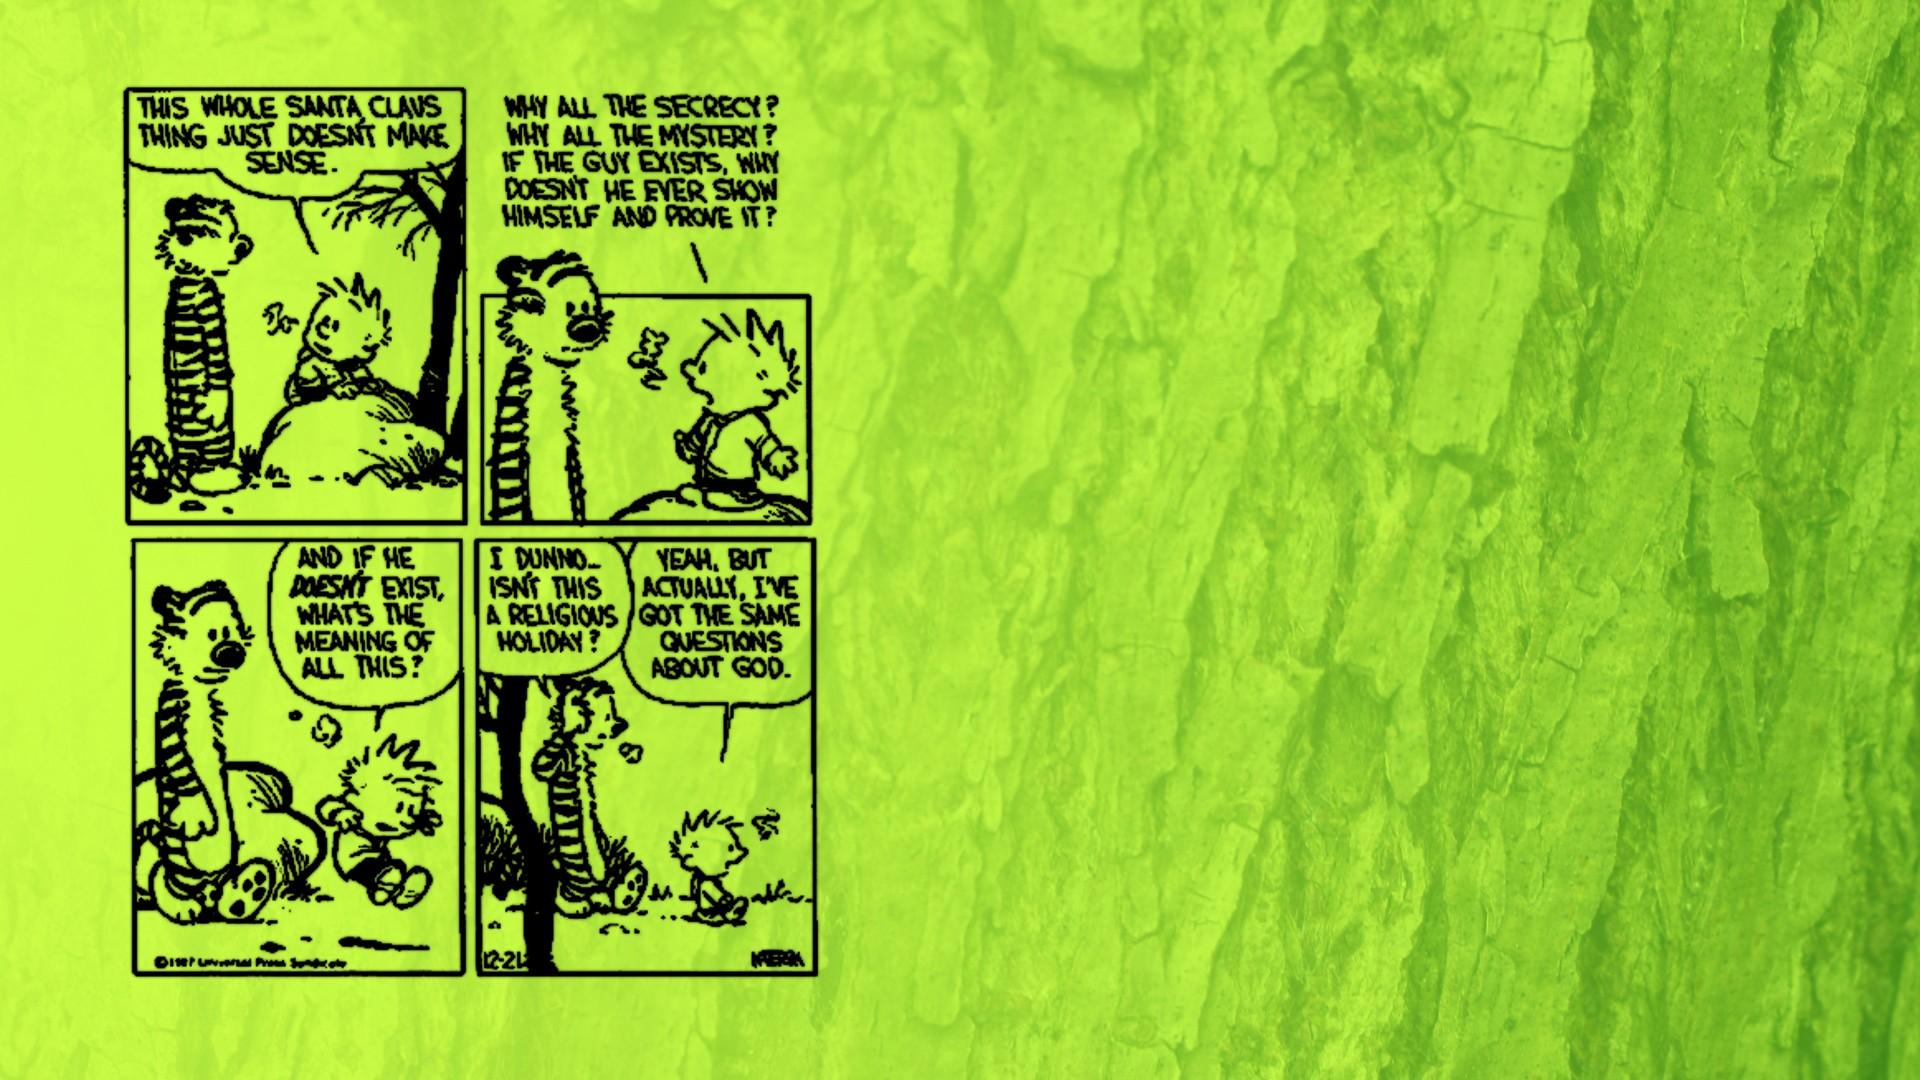 Wallpaper 1920x1080 Px And Calvin Christmas Comics Hobbes